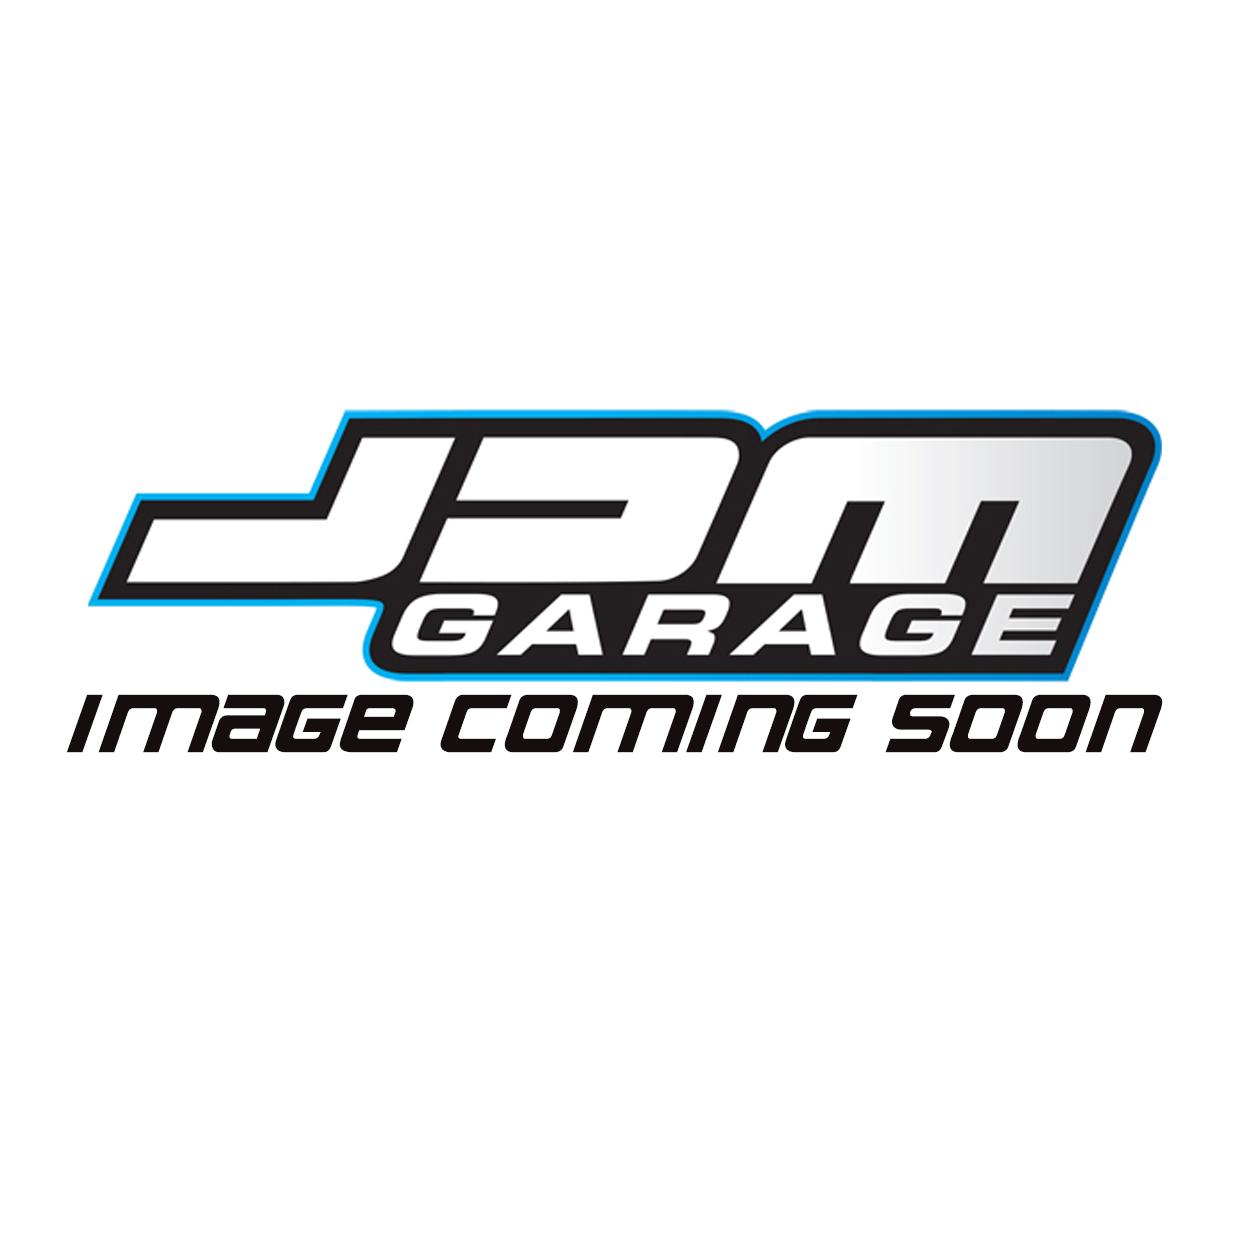 Exedy Clutch Kit Organic / Sport / Race For Honda Civic EE9 / EG6 / EK4 / EK9 / EP3